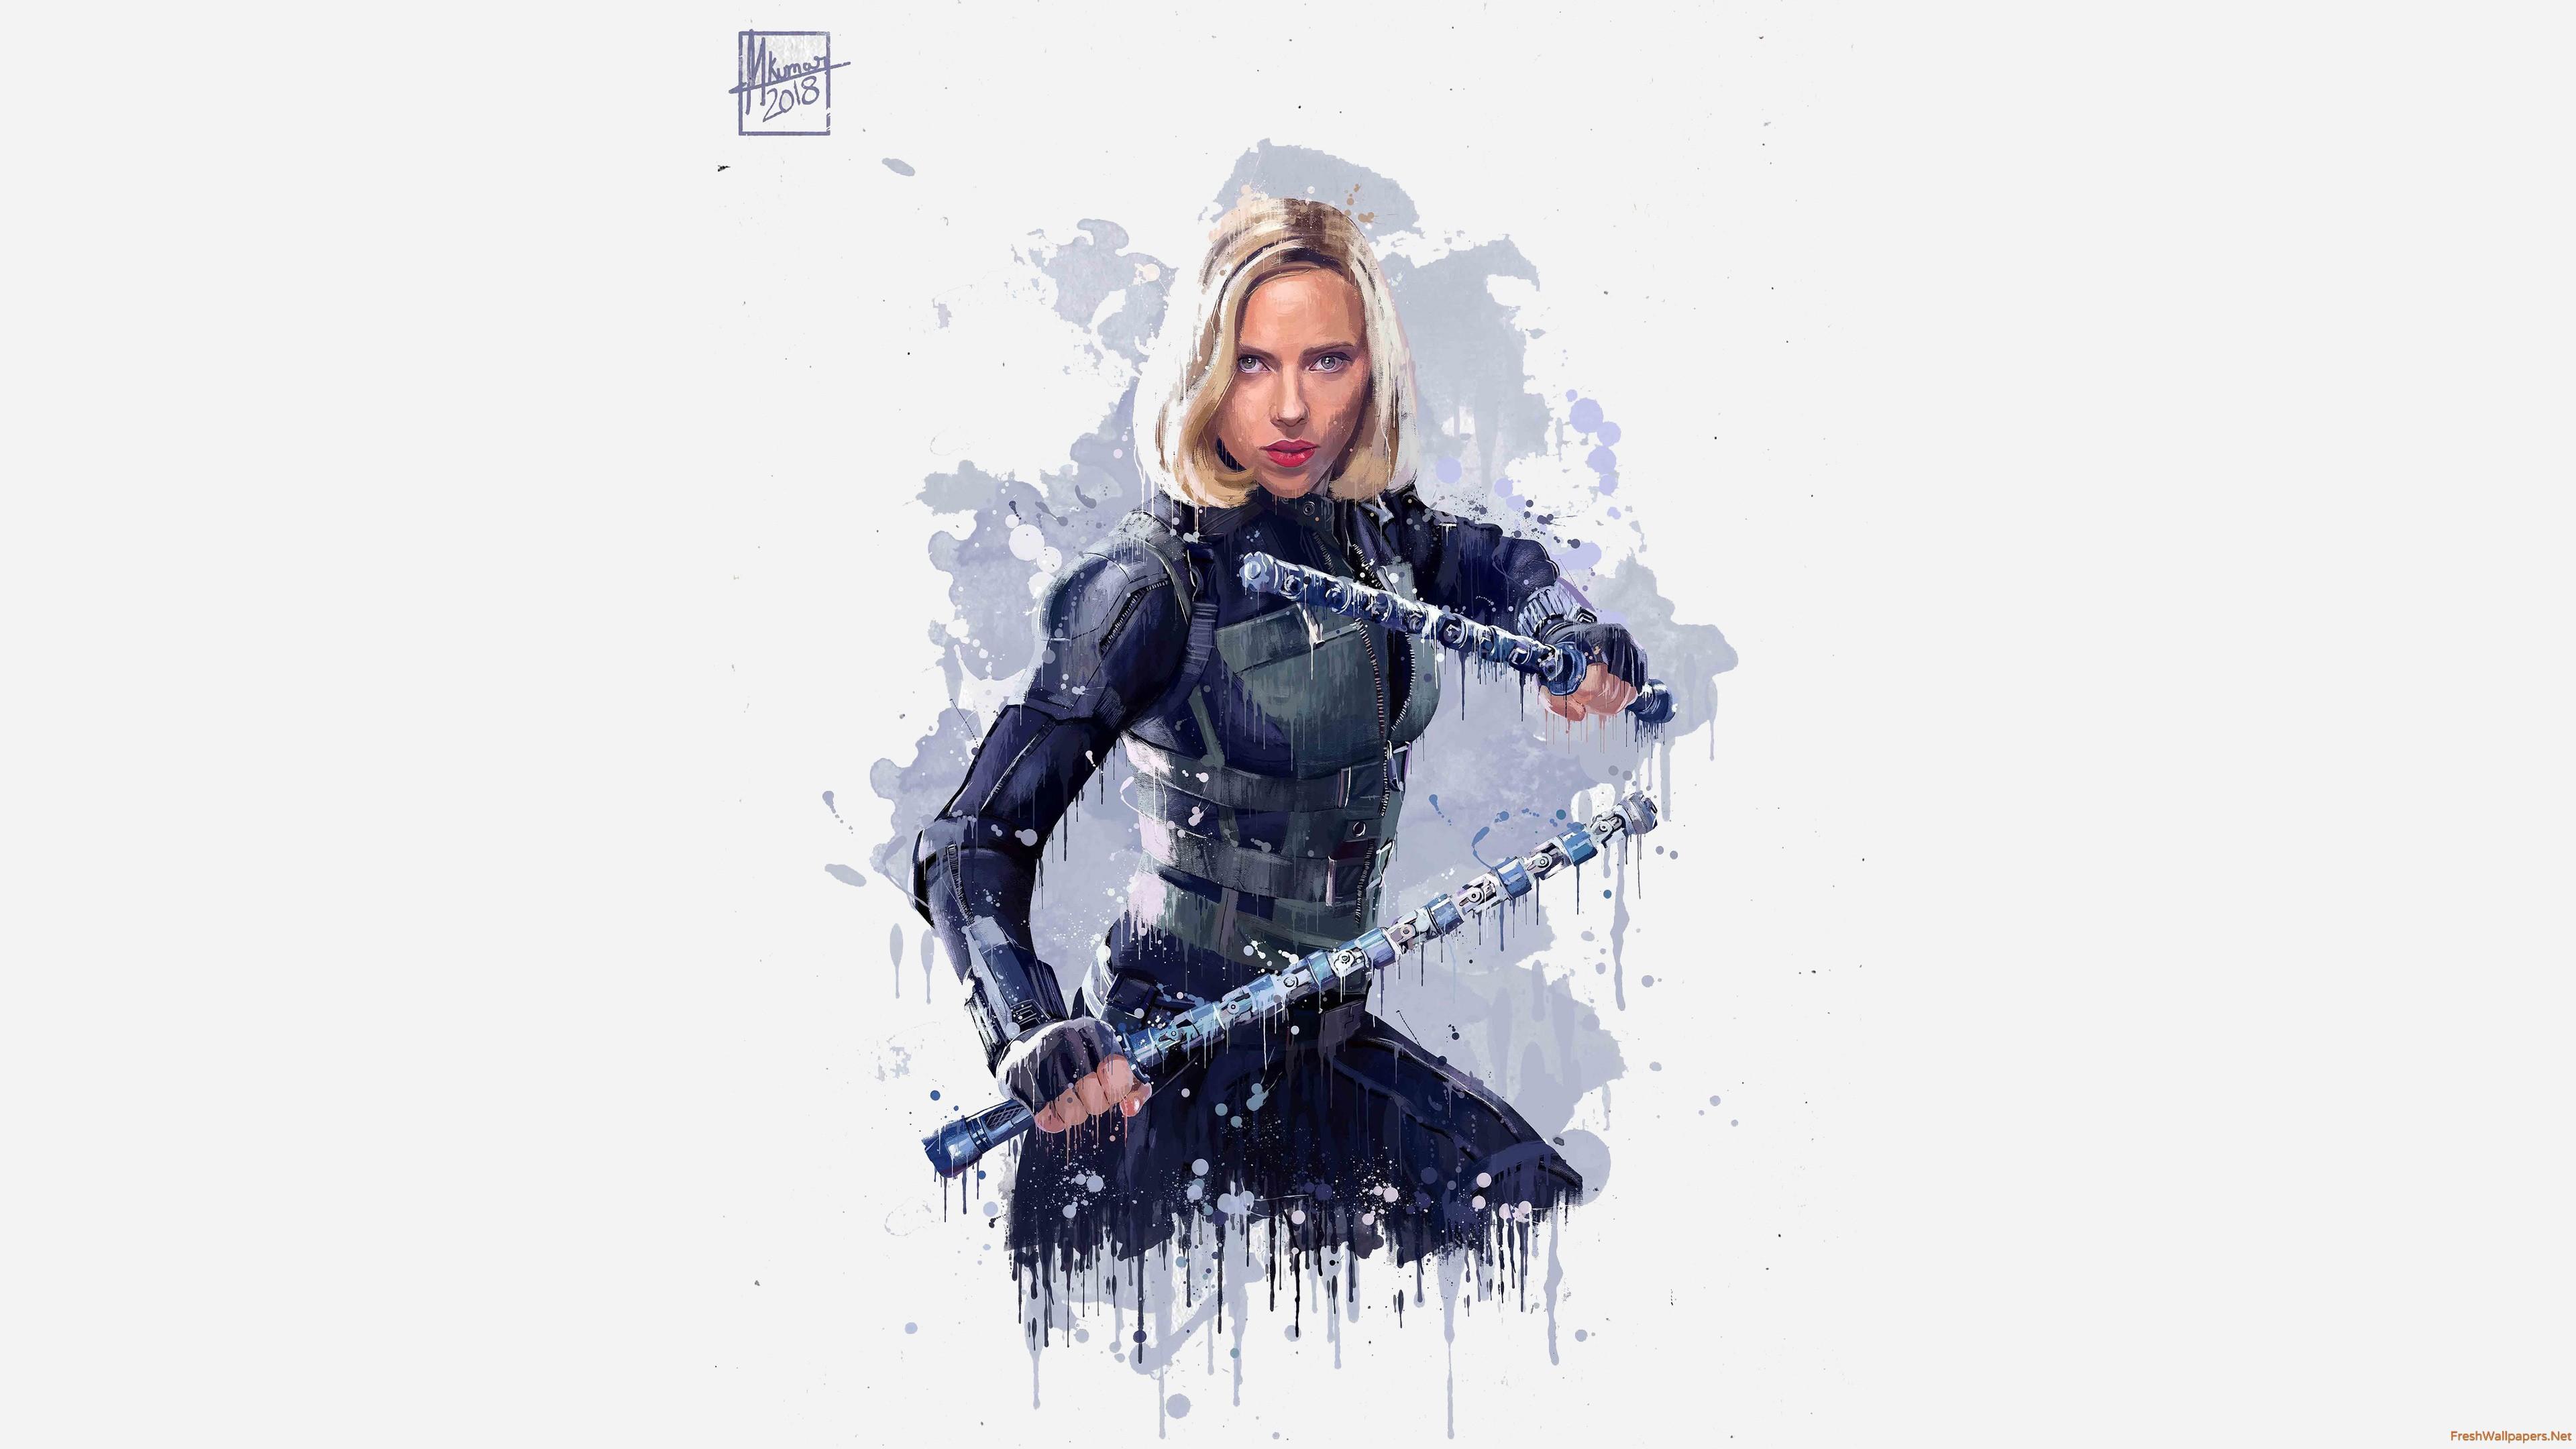 Black Widow Avengers Infinity War Artwork Wallpaper Black